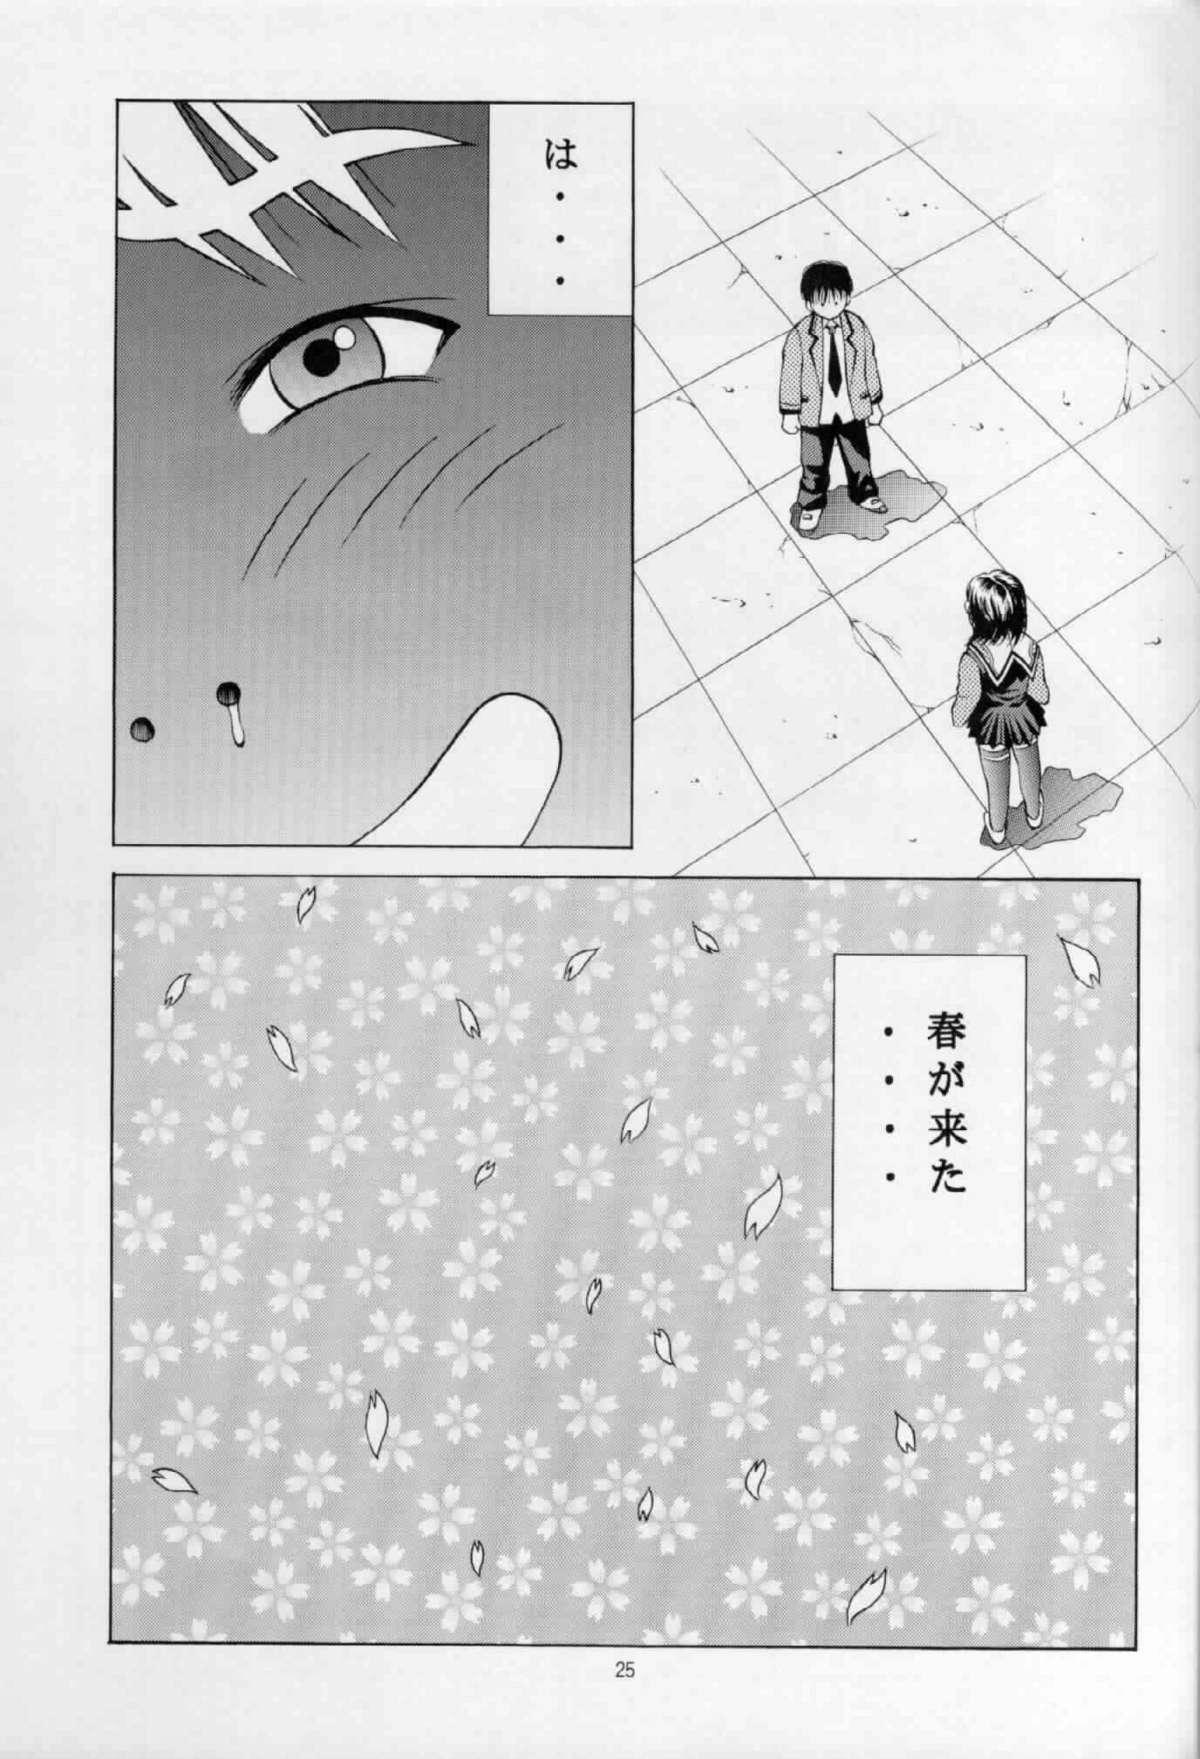 Fuwafuwarin 23